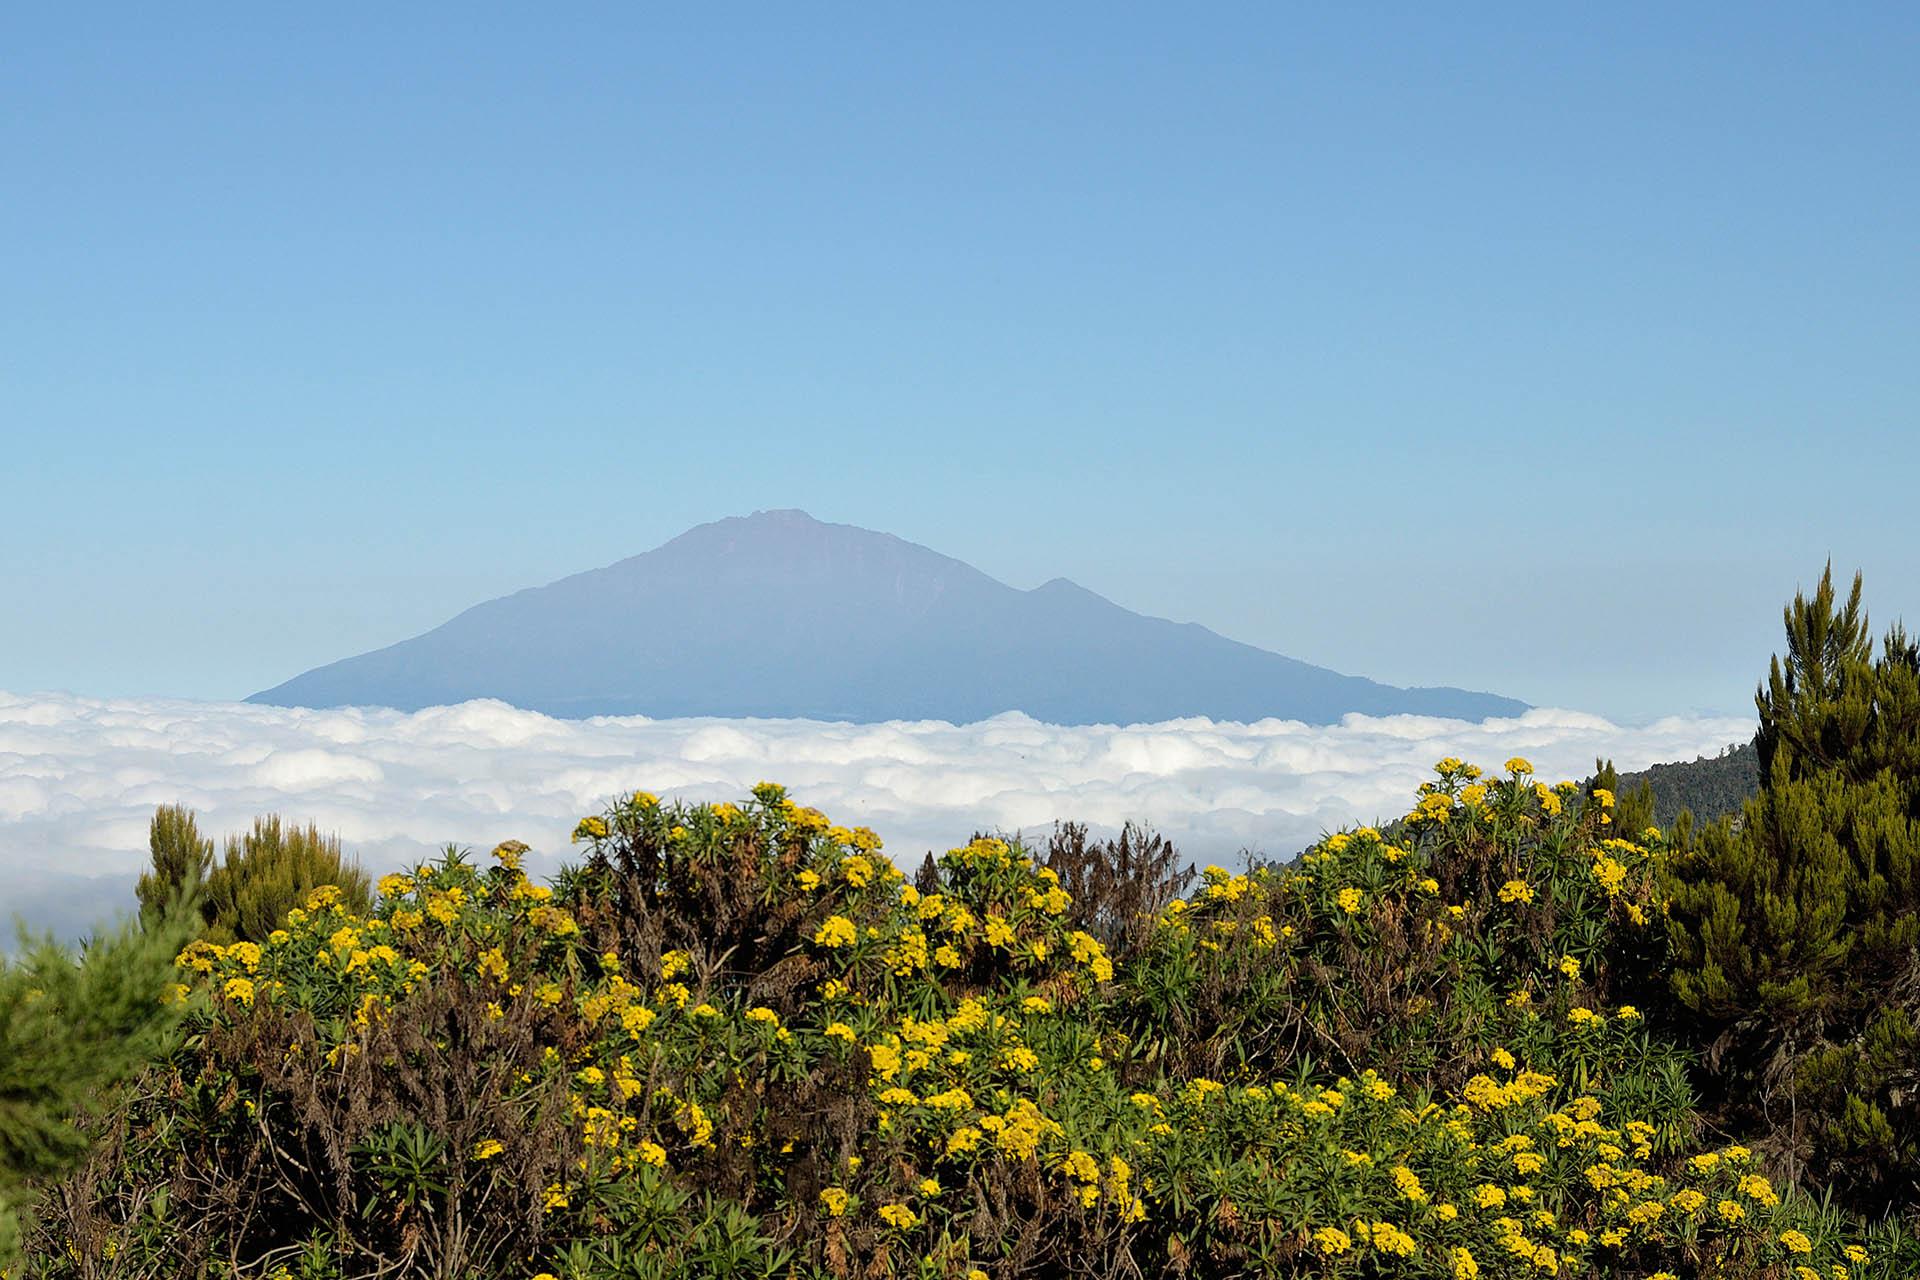 machame-scheduled-departure-mt-kilimanjaro-trekking-itineraries-maasai-wanderings-tanzania-africa.jpg